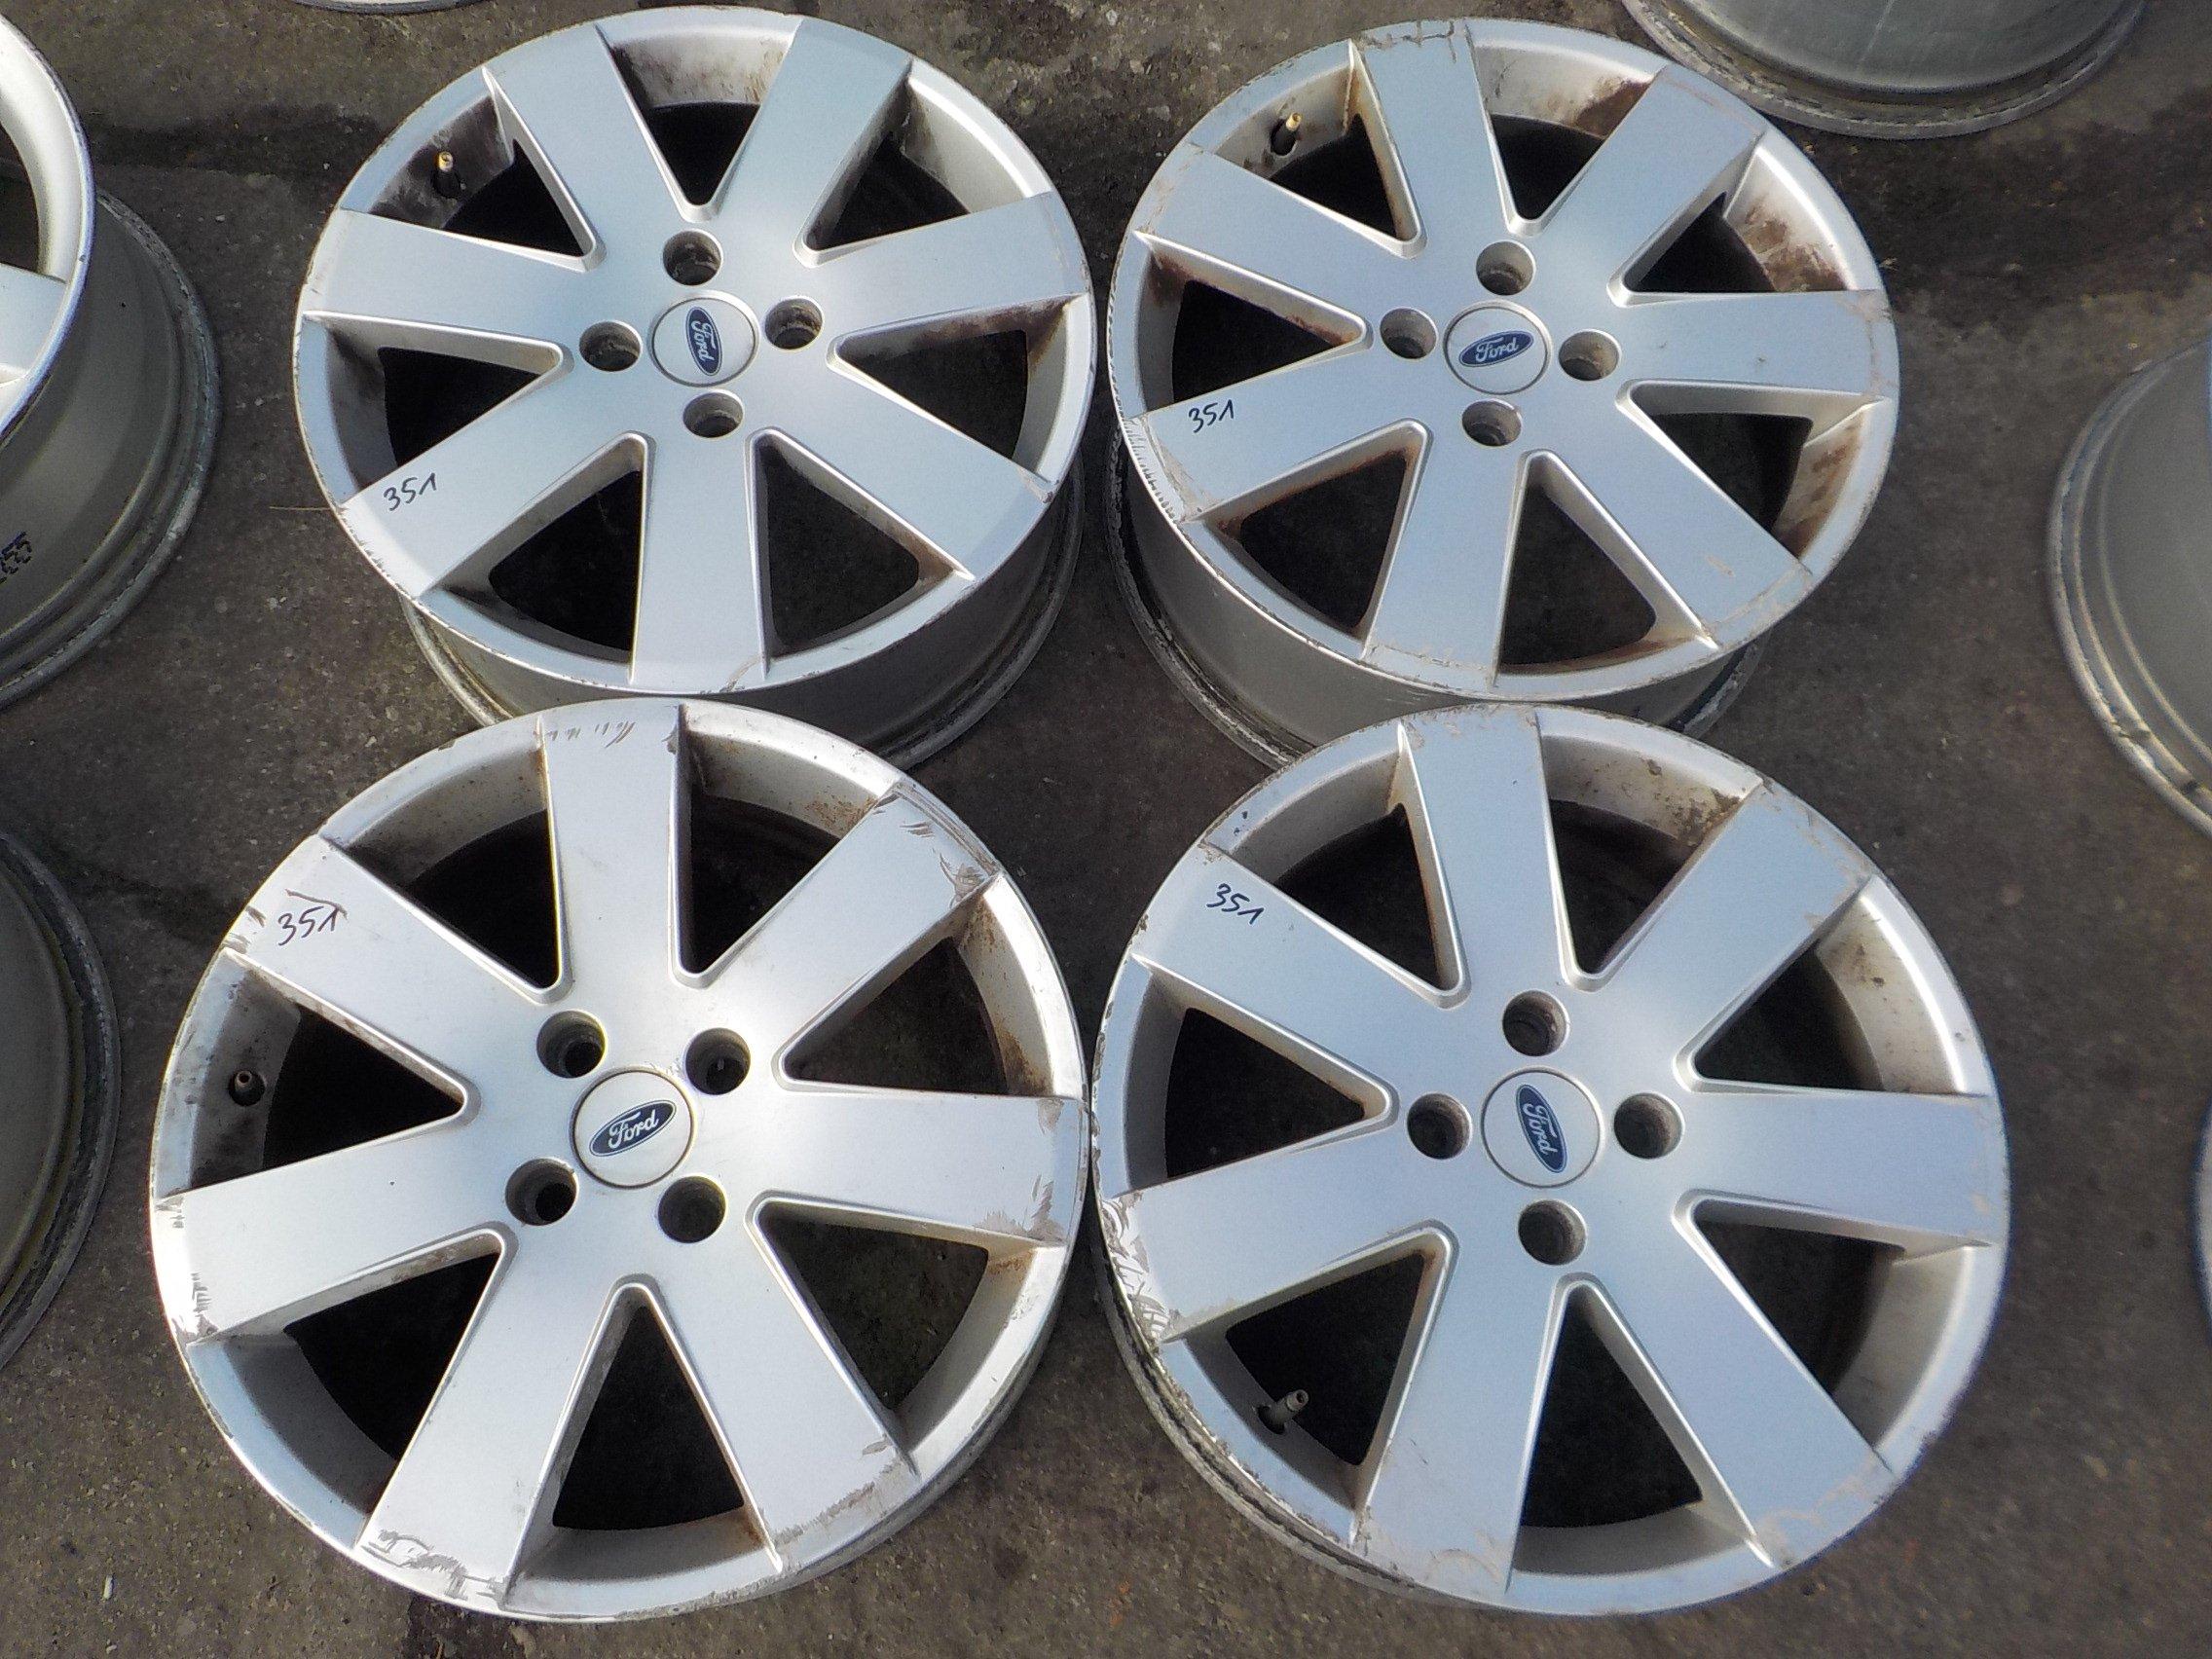 351 Felgi Aluminiowe Ford Focus Mk1 4x108 R17 7245875741